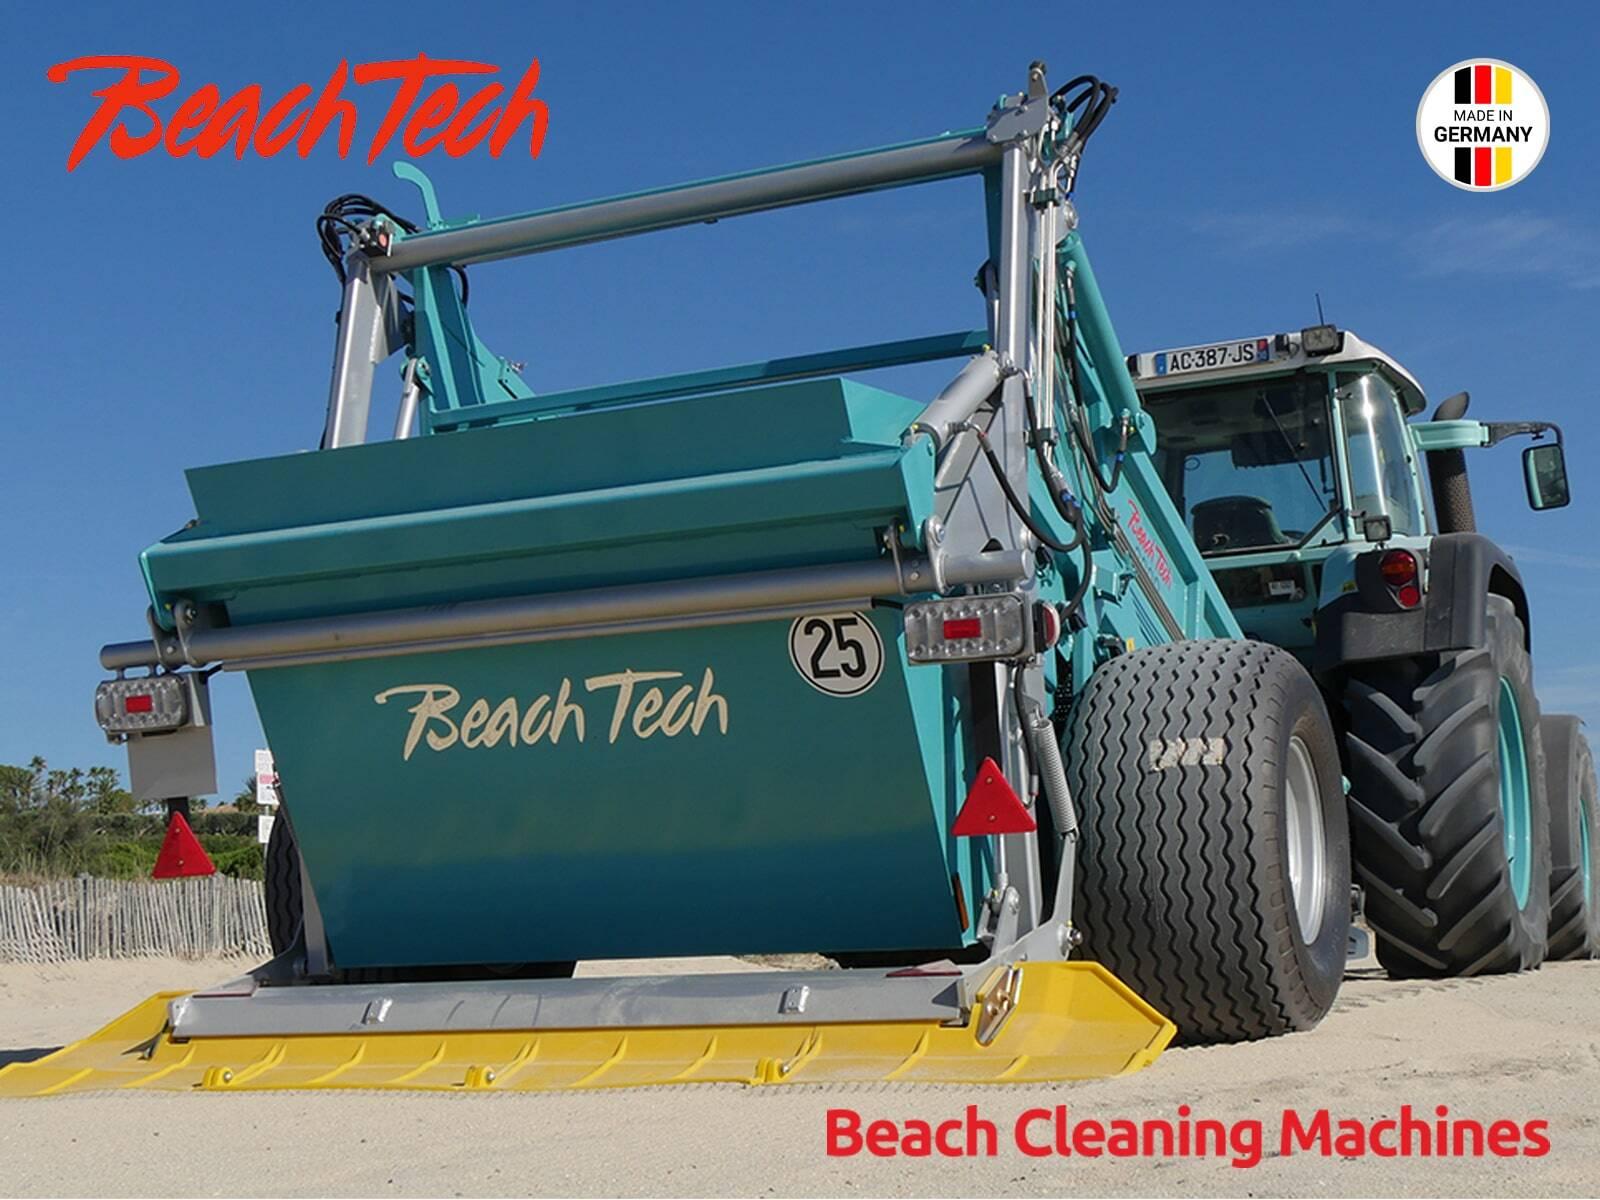 BEACHTECH Image